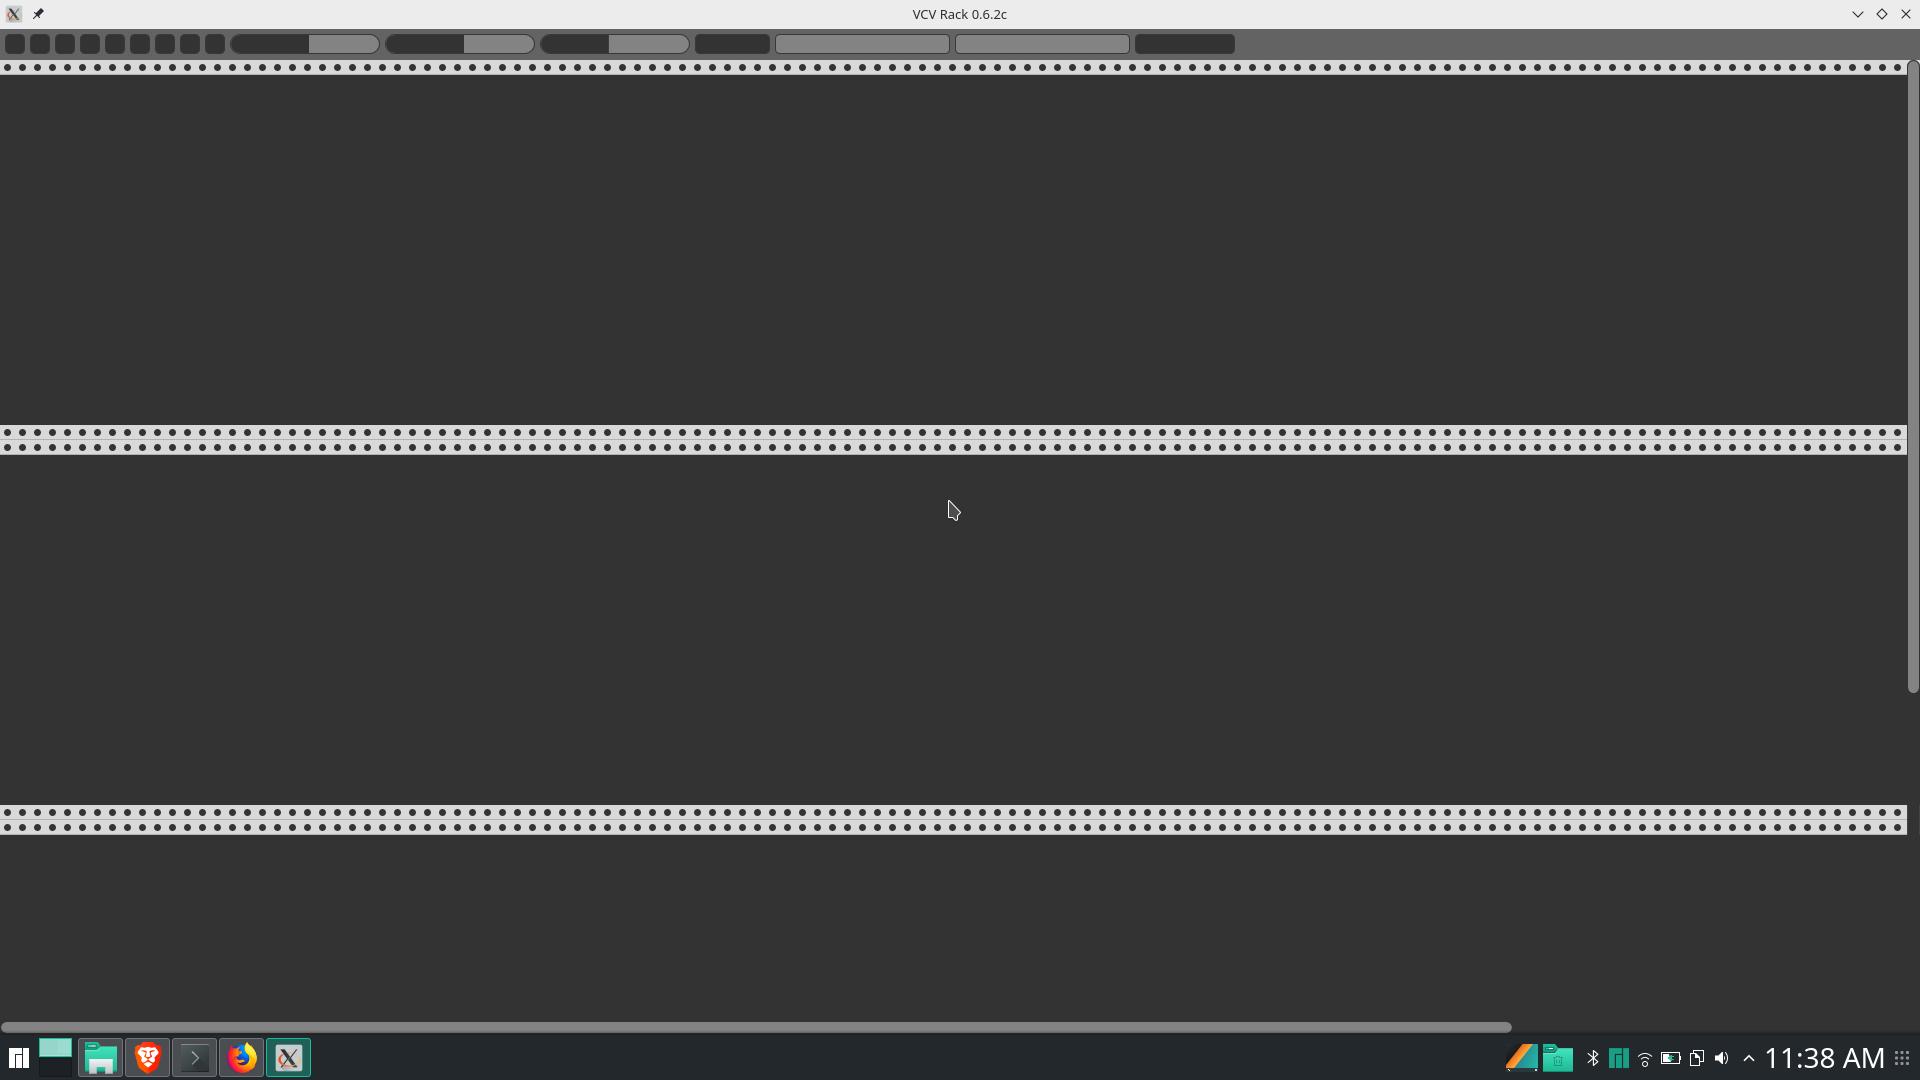 Rack doesn't look right on Arch linux - VCV Rack - VCV Community